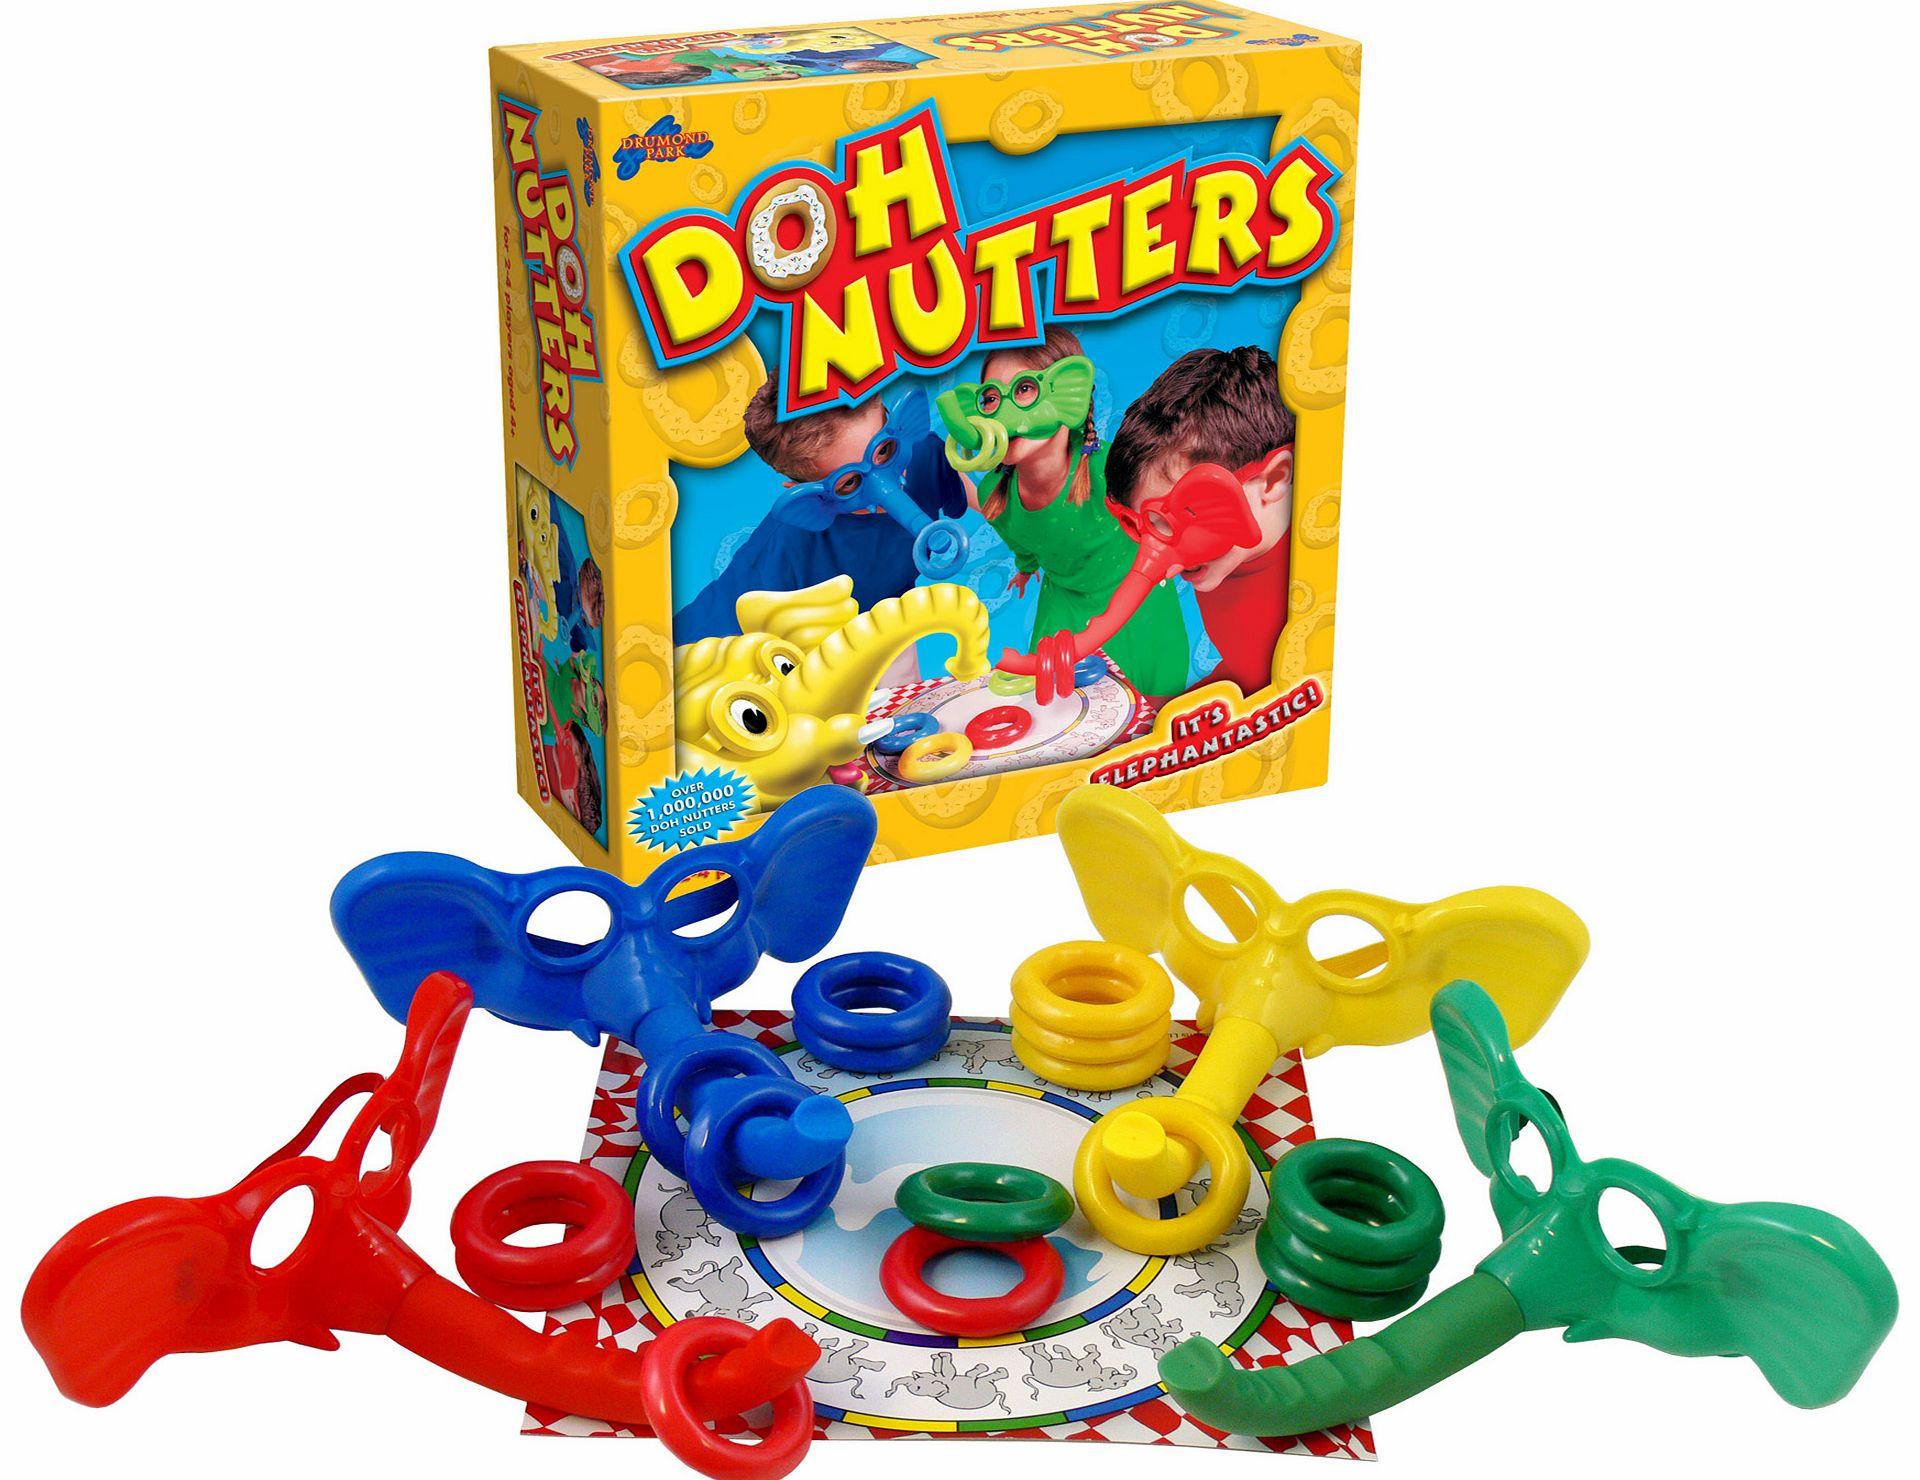 Child Cd Player